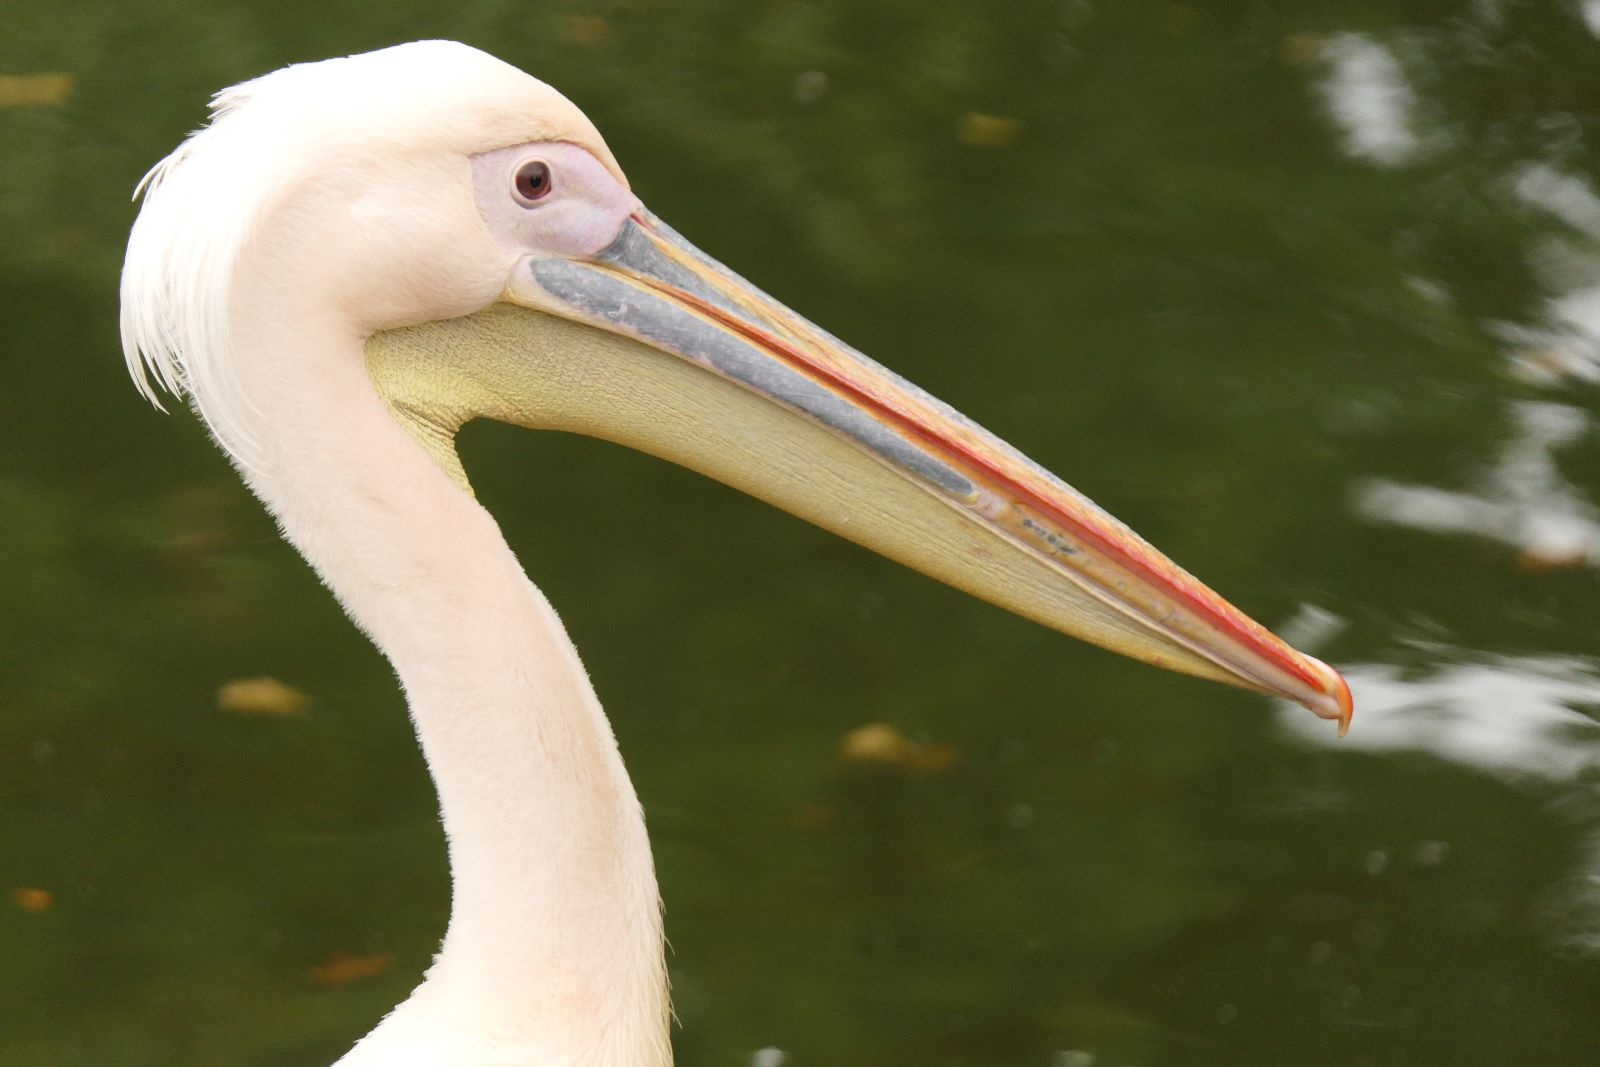 Len Payne pelican